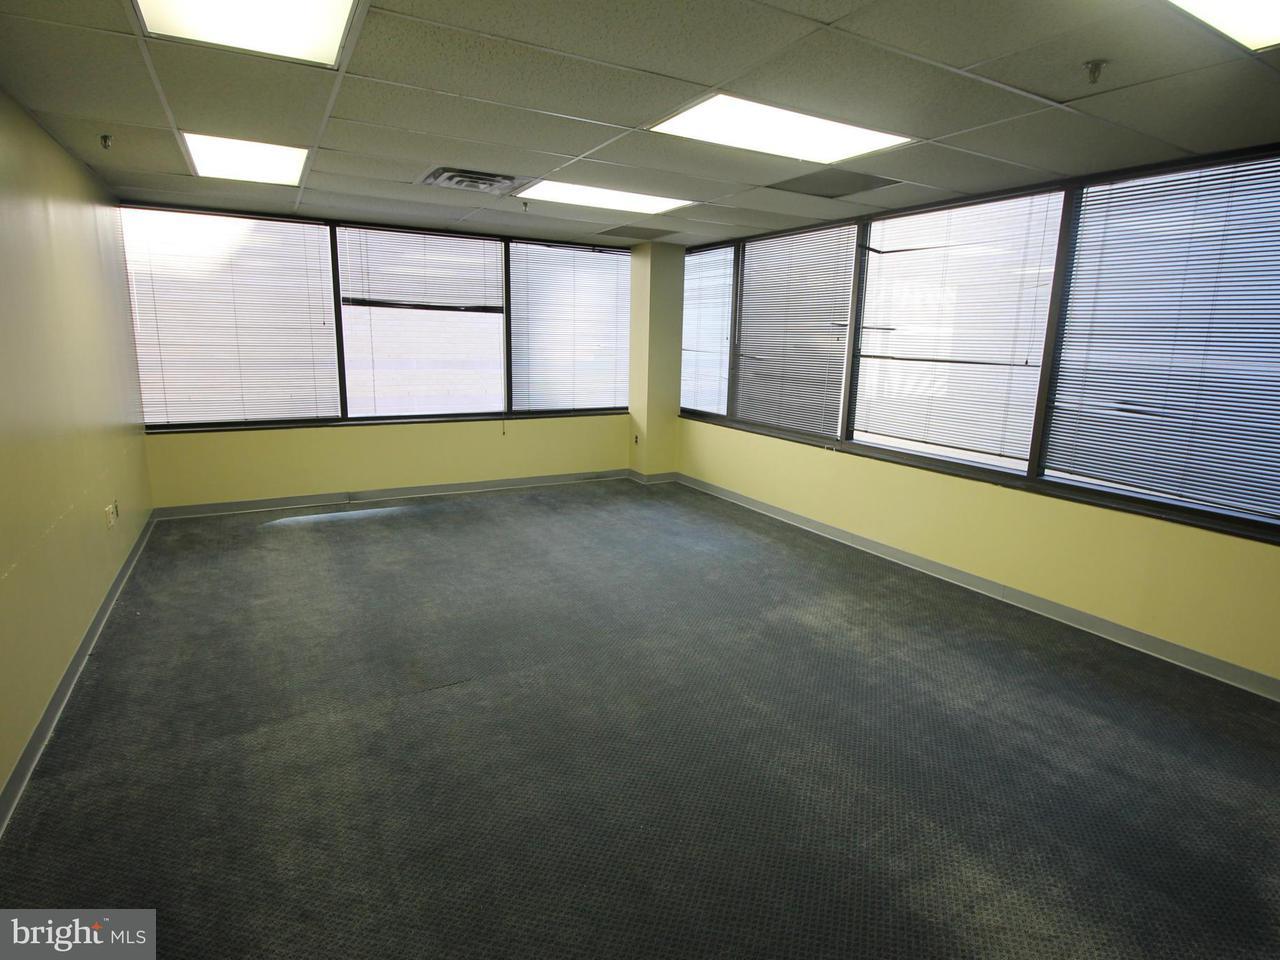 Additional photo for property listing at 1701 CLARENDON BLVD #120 1701 CLARENDON BLVD #120 Arlington, バージニア 22209 アメリカ合衆国